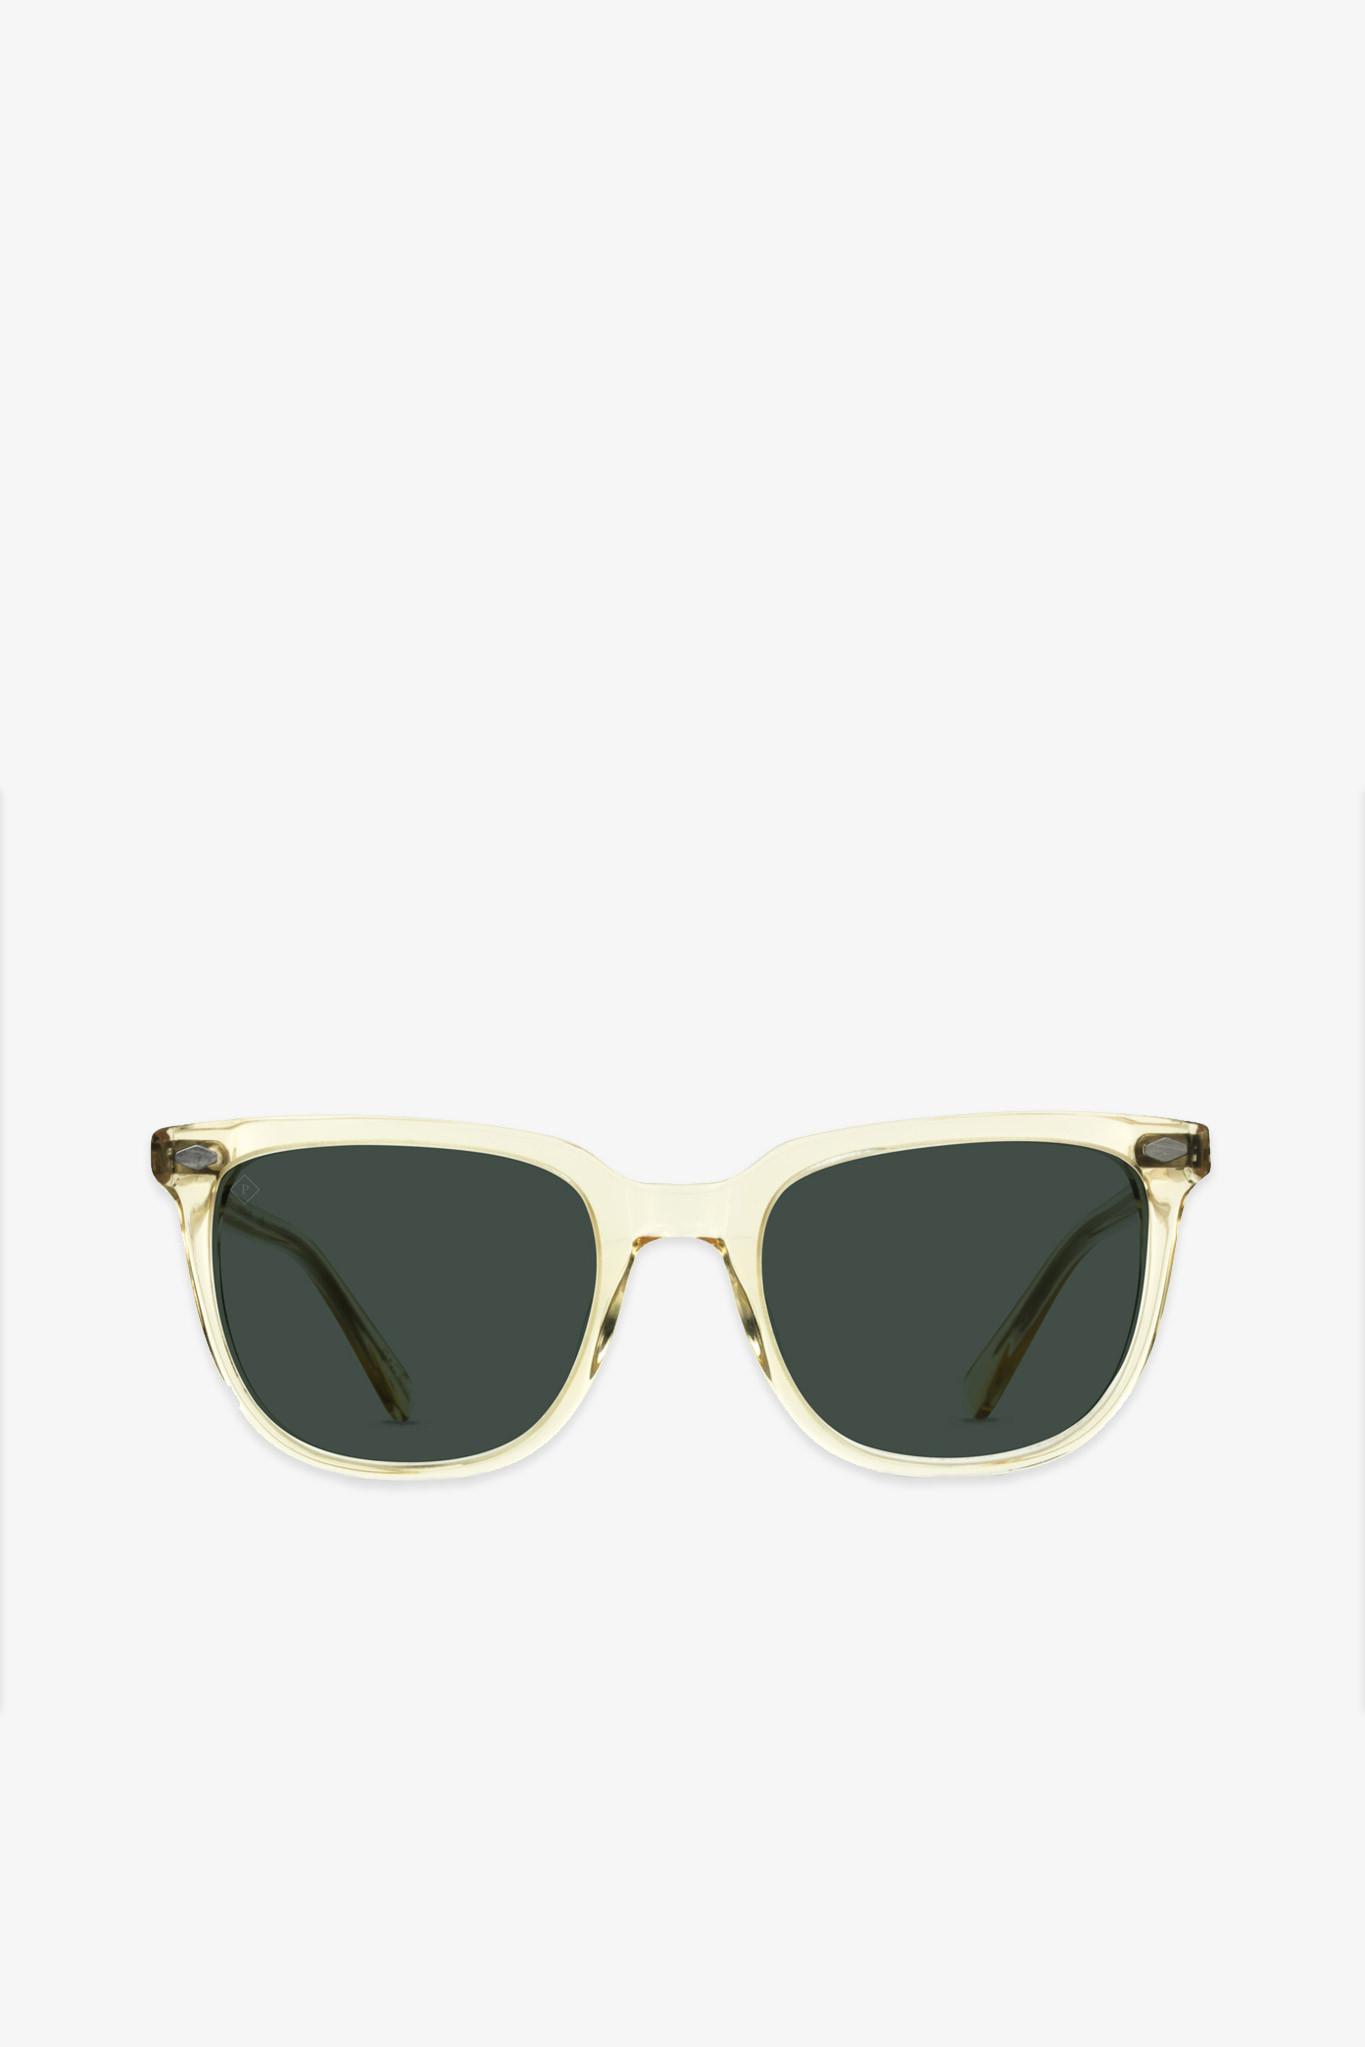 e604e875058b Raen Optics Arlo Polarized Sunglasses in Champagne Crystal | Garmentory